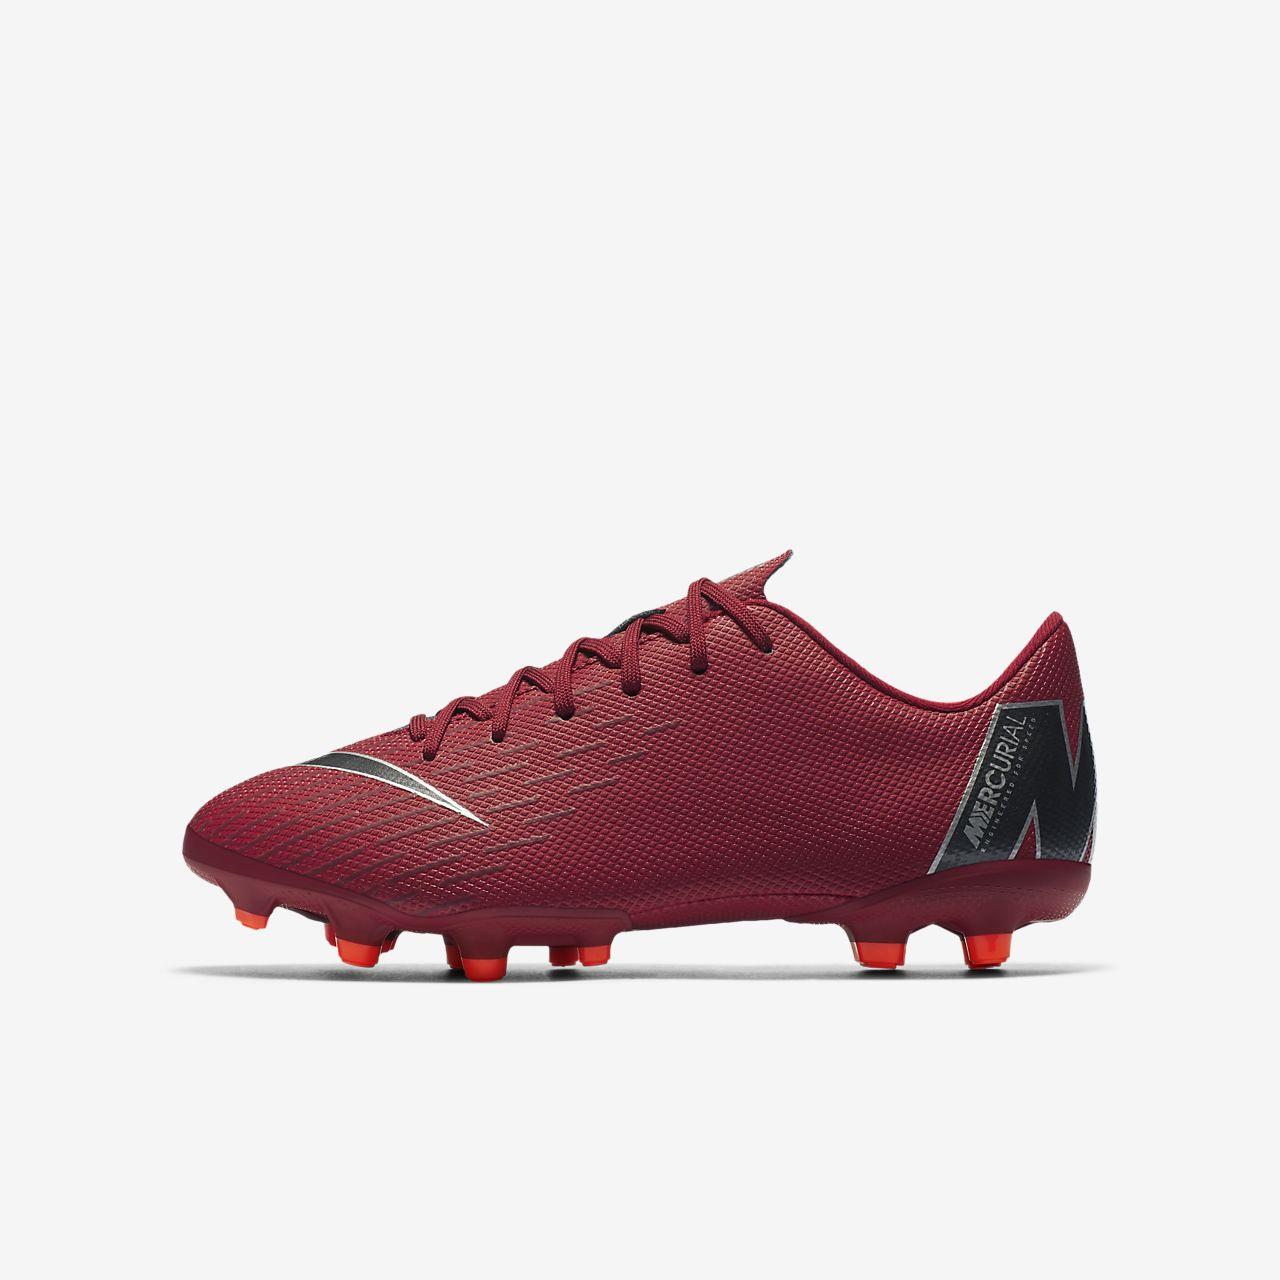 meet c4e33 ab8b4 Nike Jr. Mercurial Vapor XII Academy MG